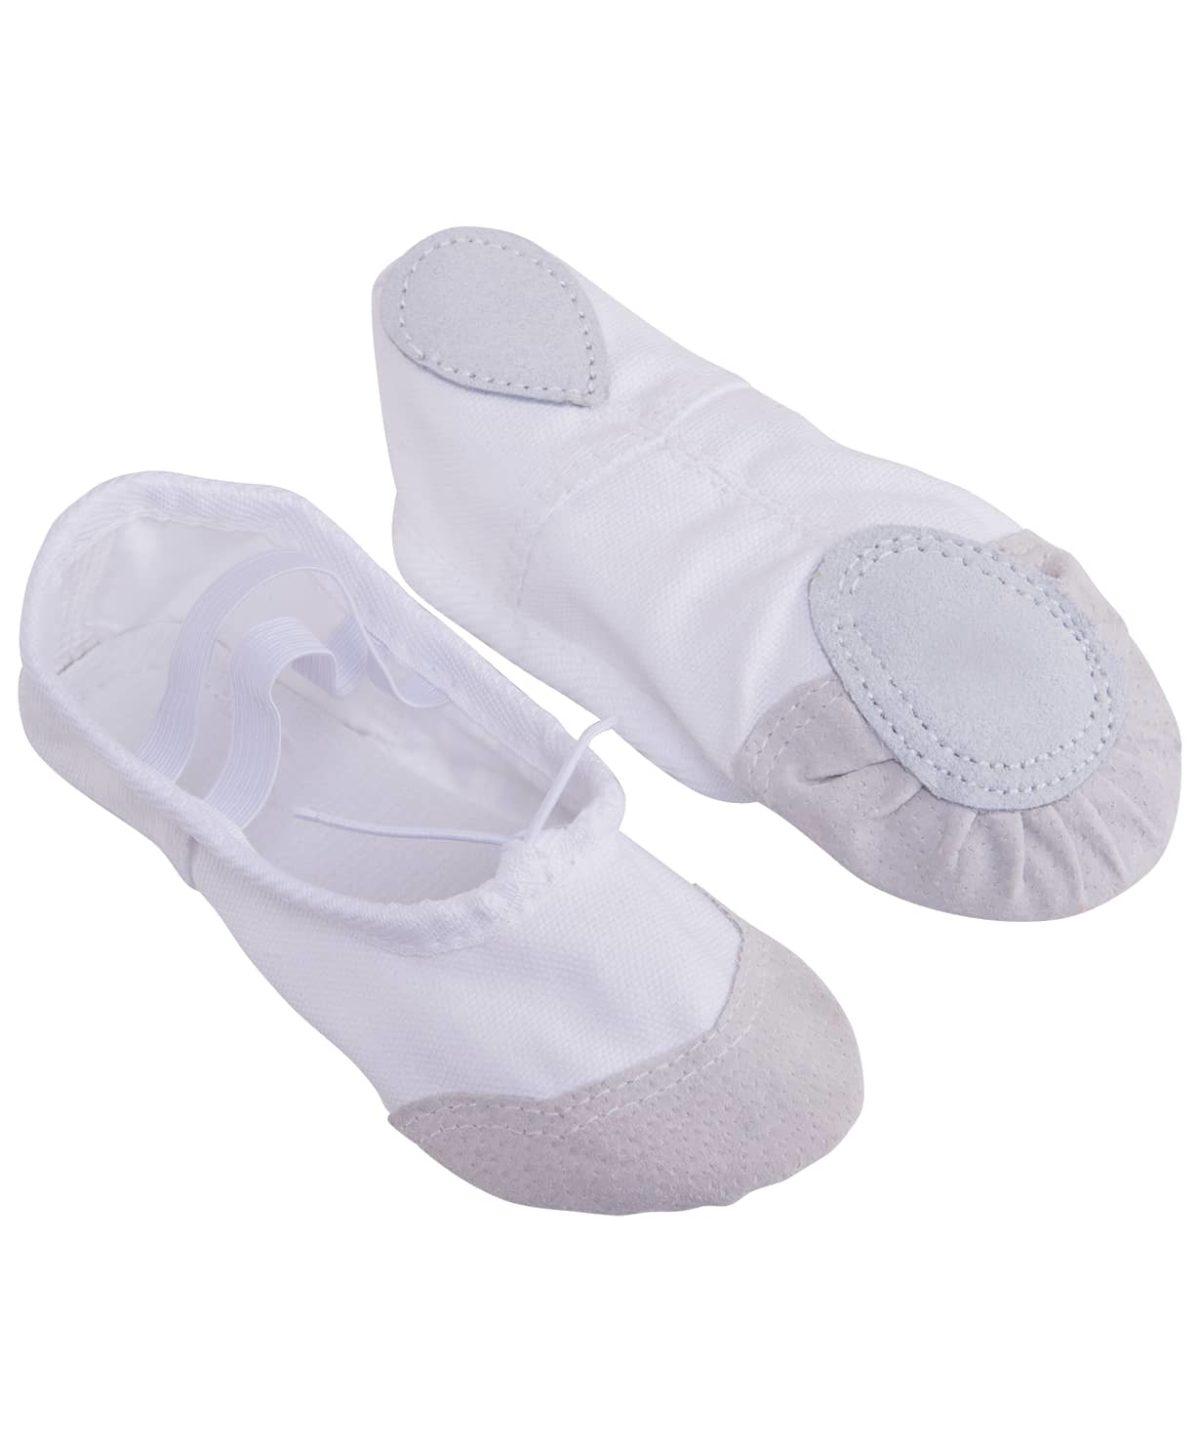 AMELY Балетки текстиль (27-31)  SL-01: белый - 1